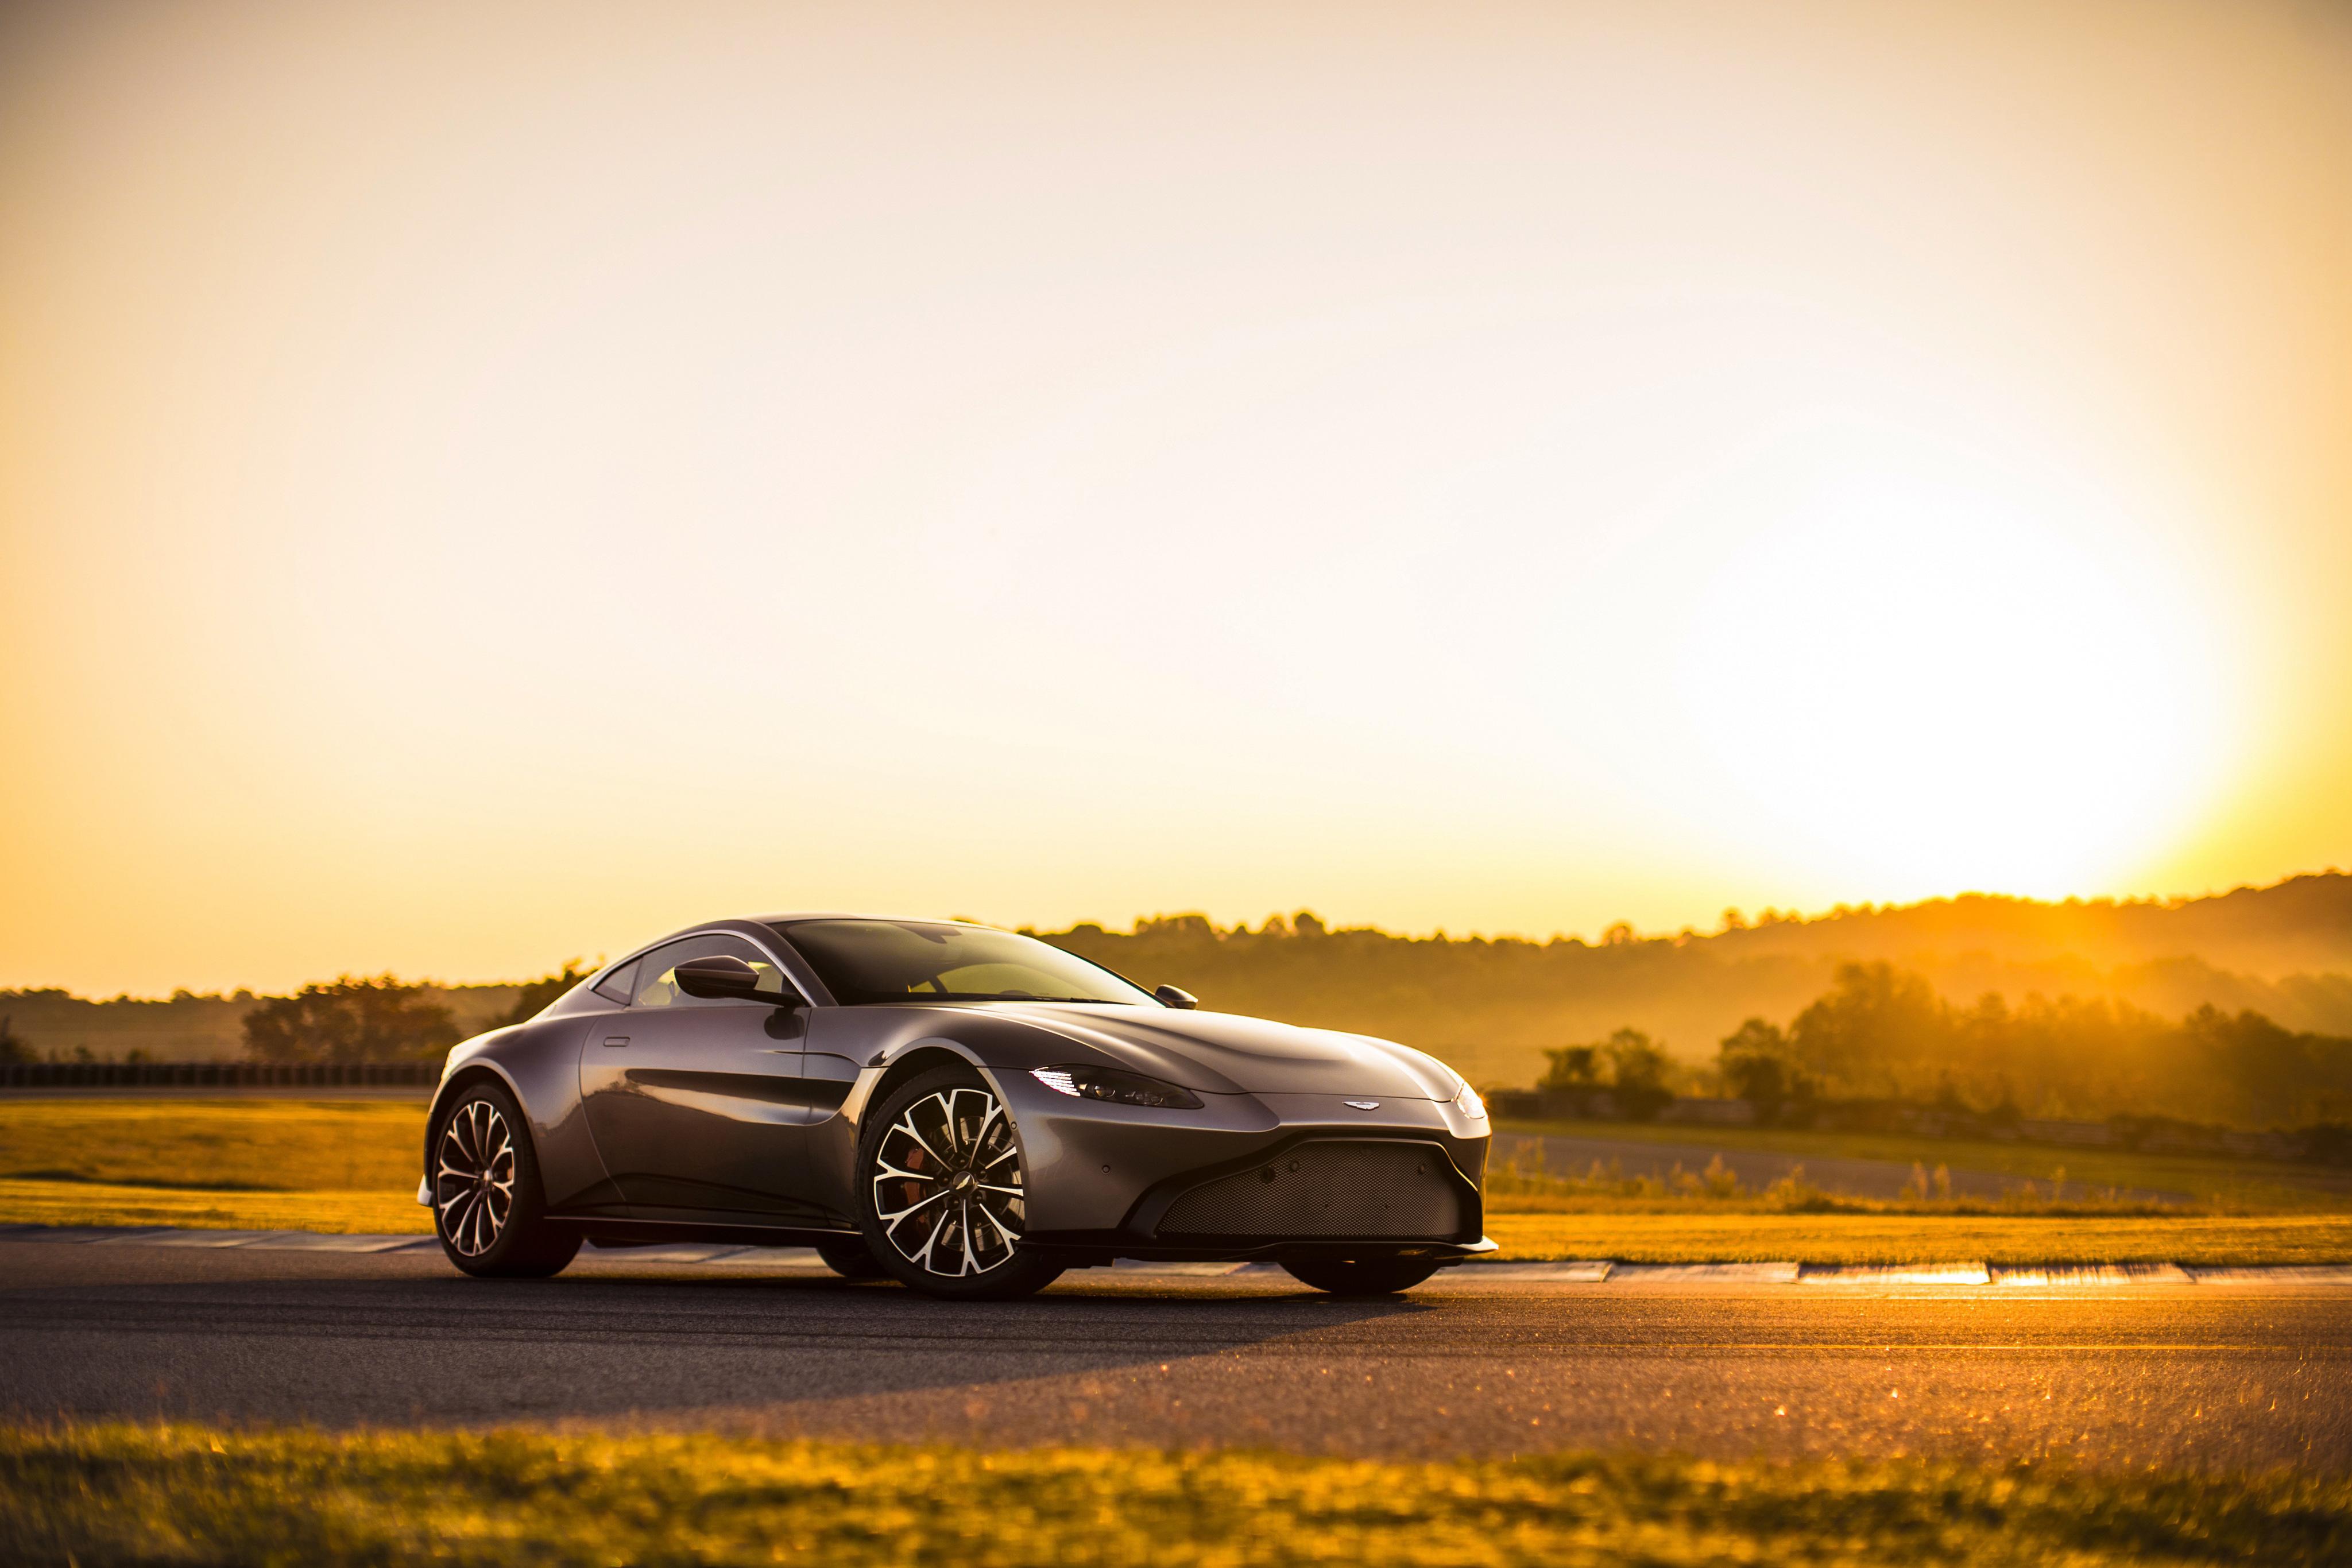 Aston Martin Vantage 2018 Hd Cars 4k Wallpapers Images